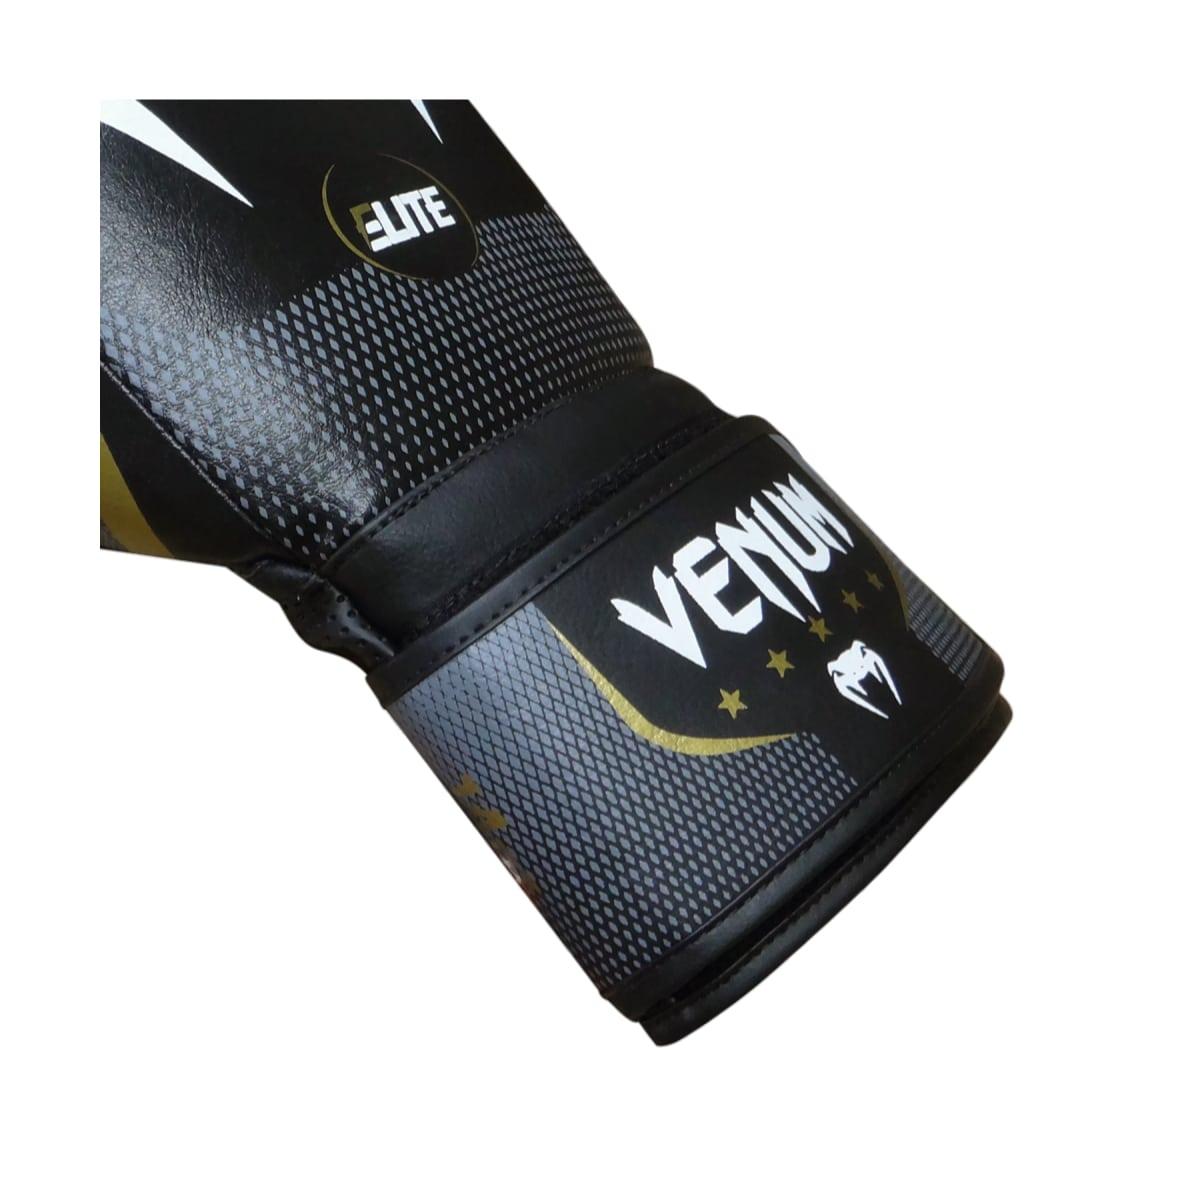 Luva Boxe Venum New Elite 2.0 - Preto